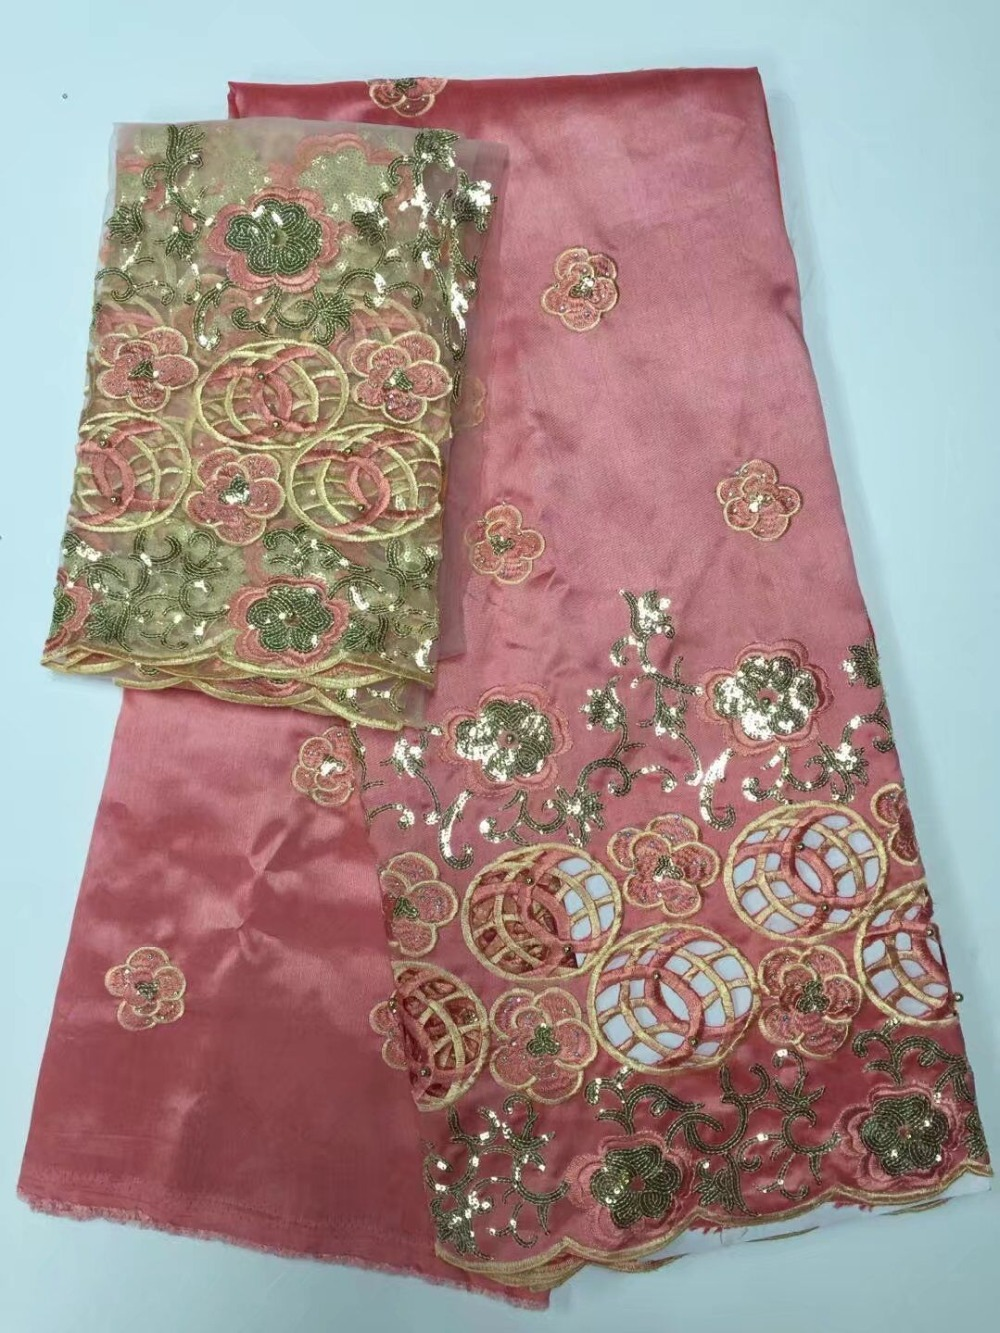 Latest Popular Design Peach Sequin Fabric 5 Yards